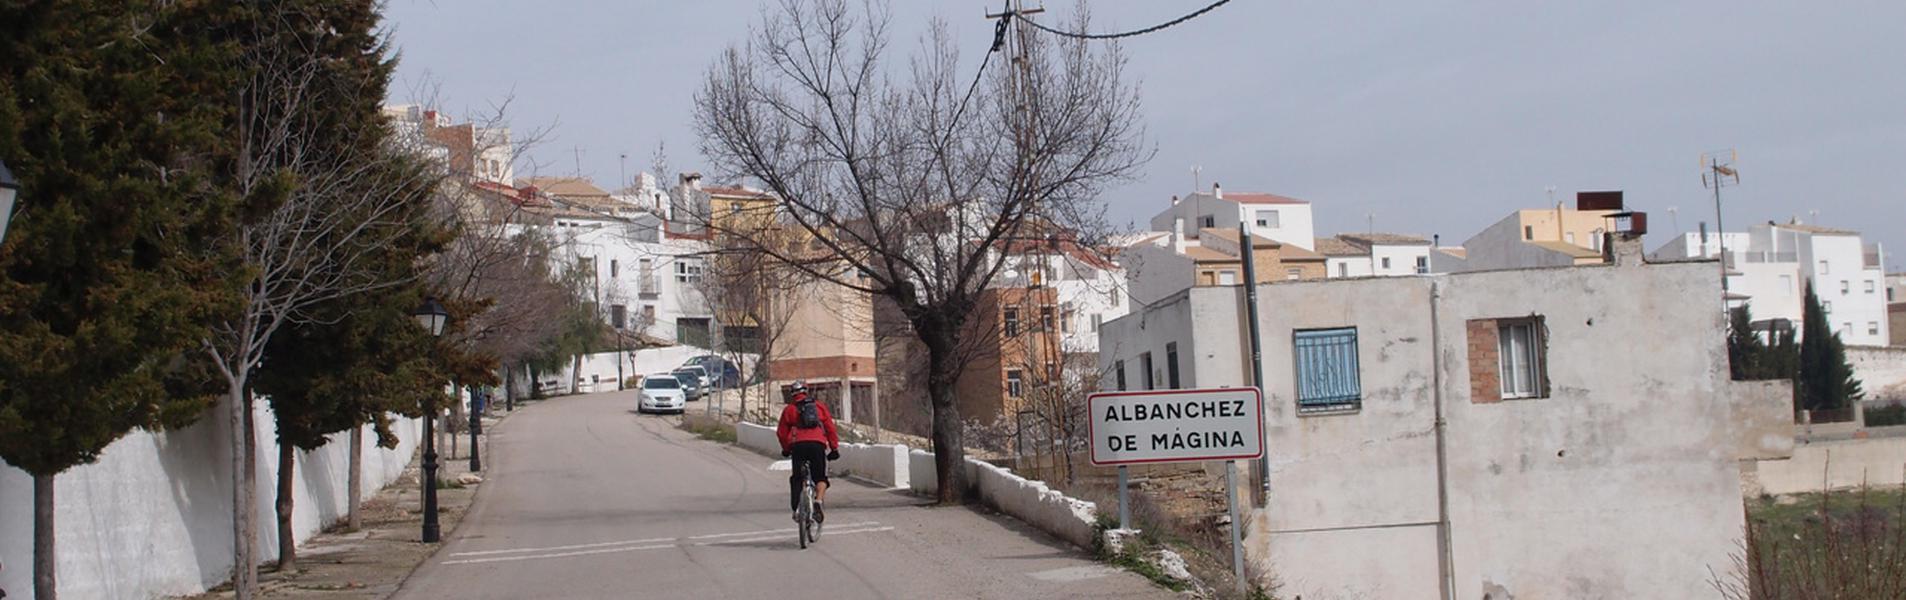 Albanchez de Mágina